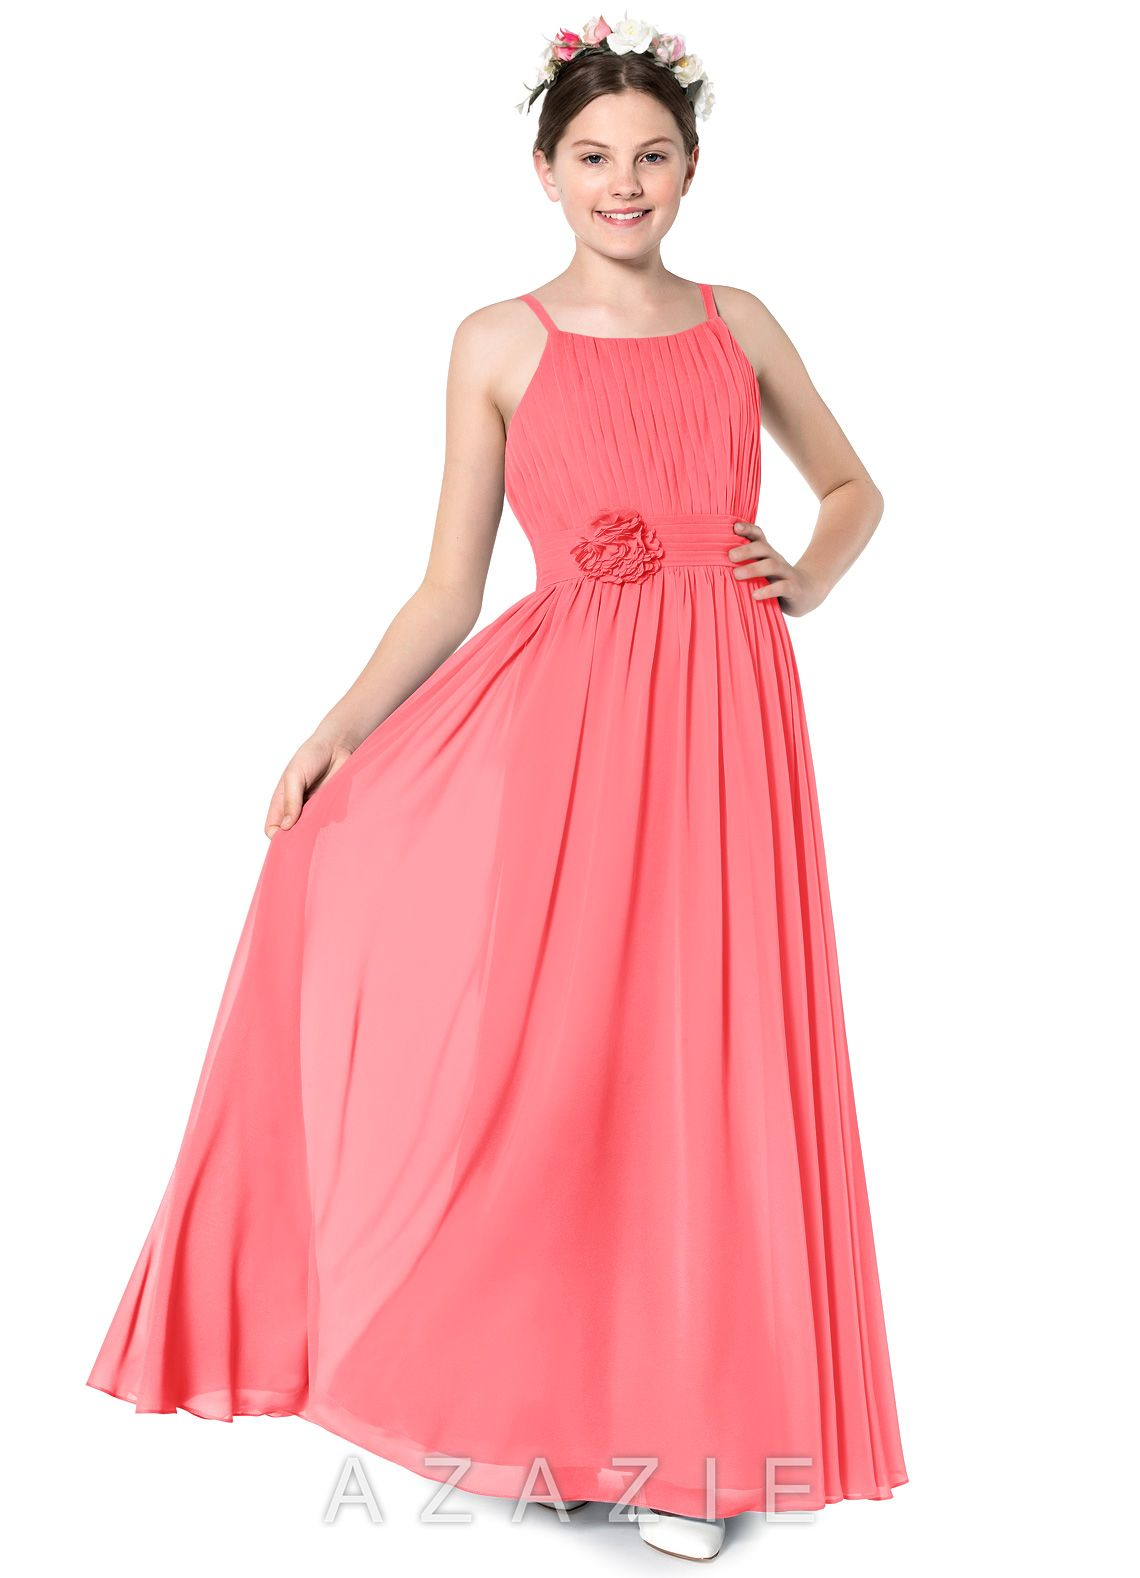 da6b6ea62 Azazie Astrid JBD Junior Bridesmaid Dress | Azazie